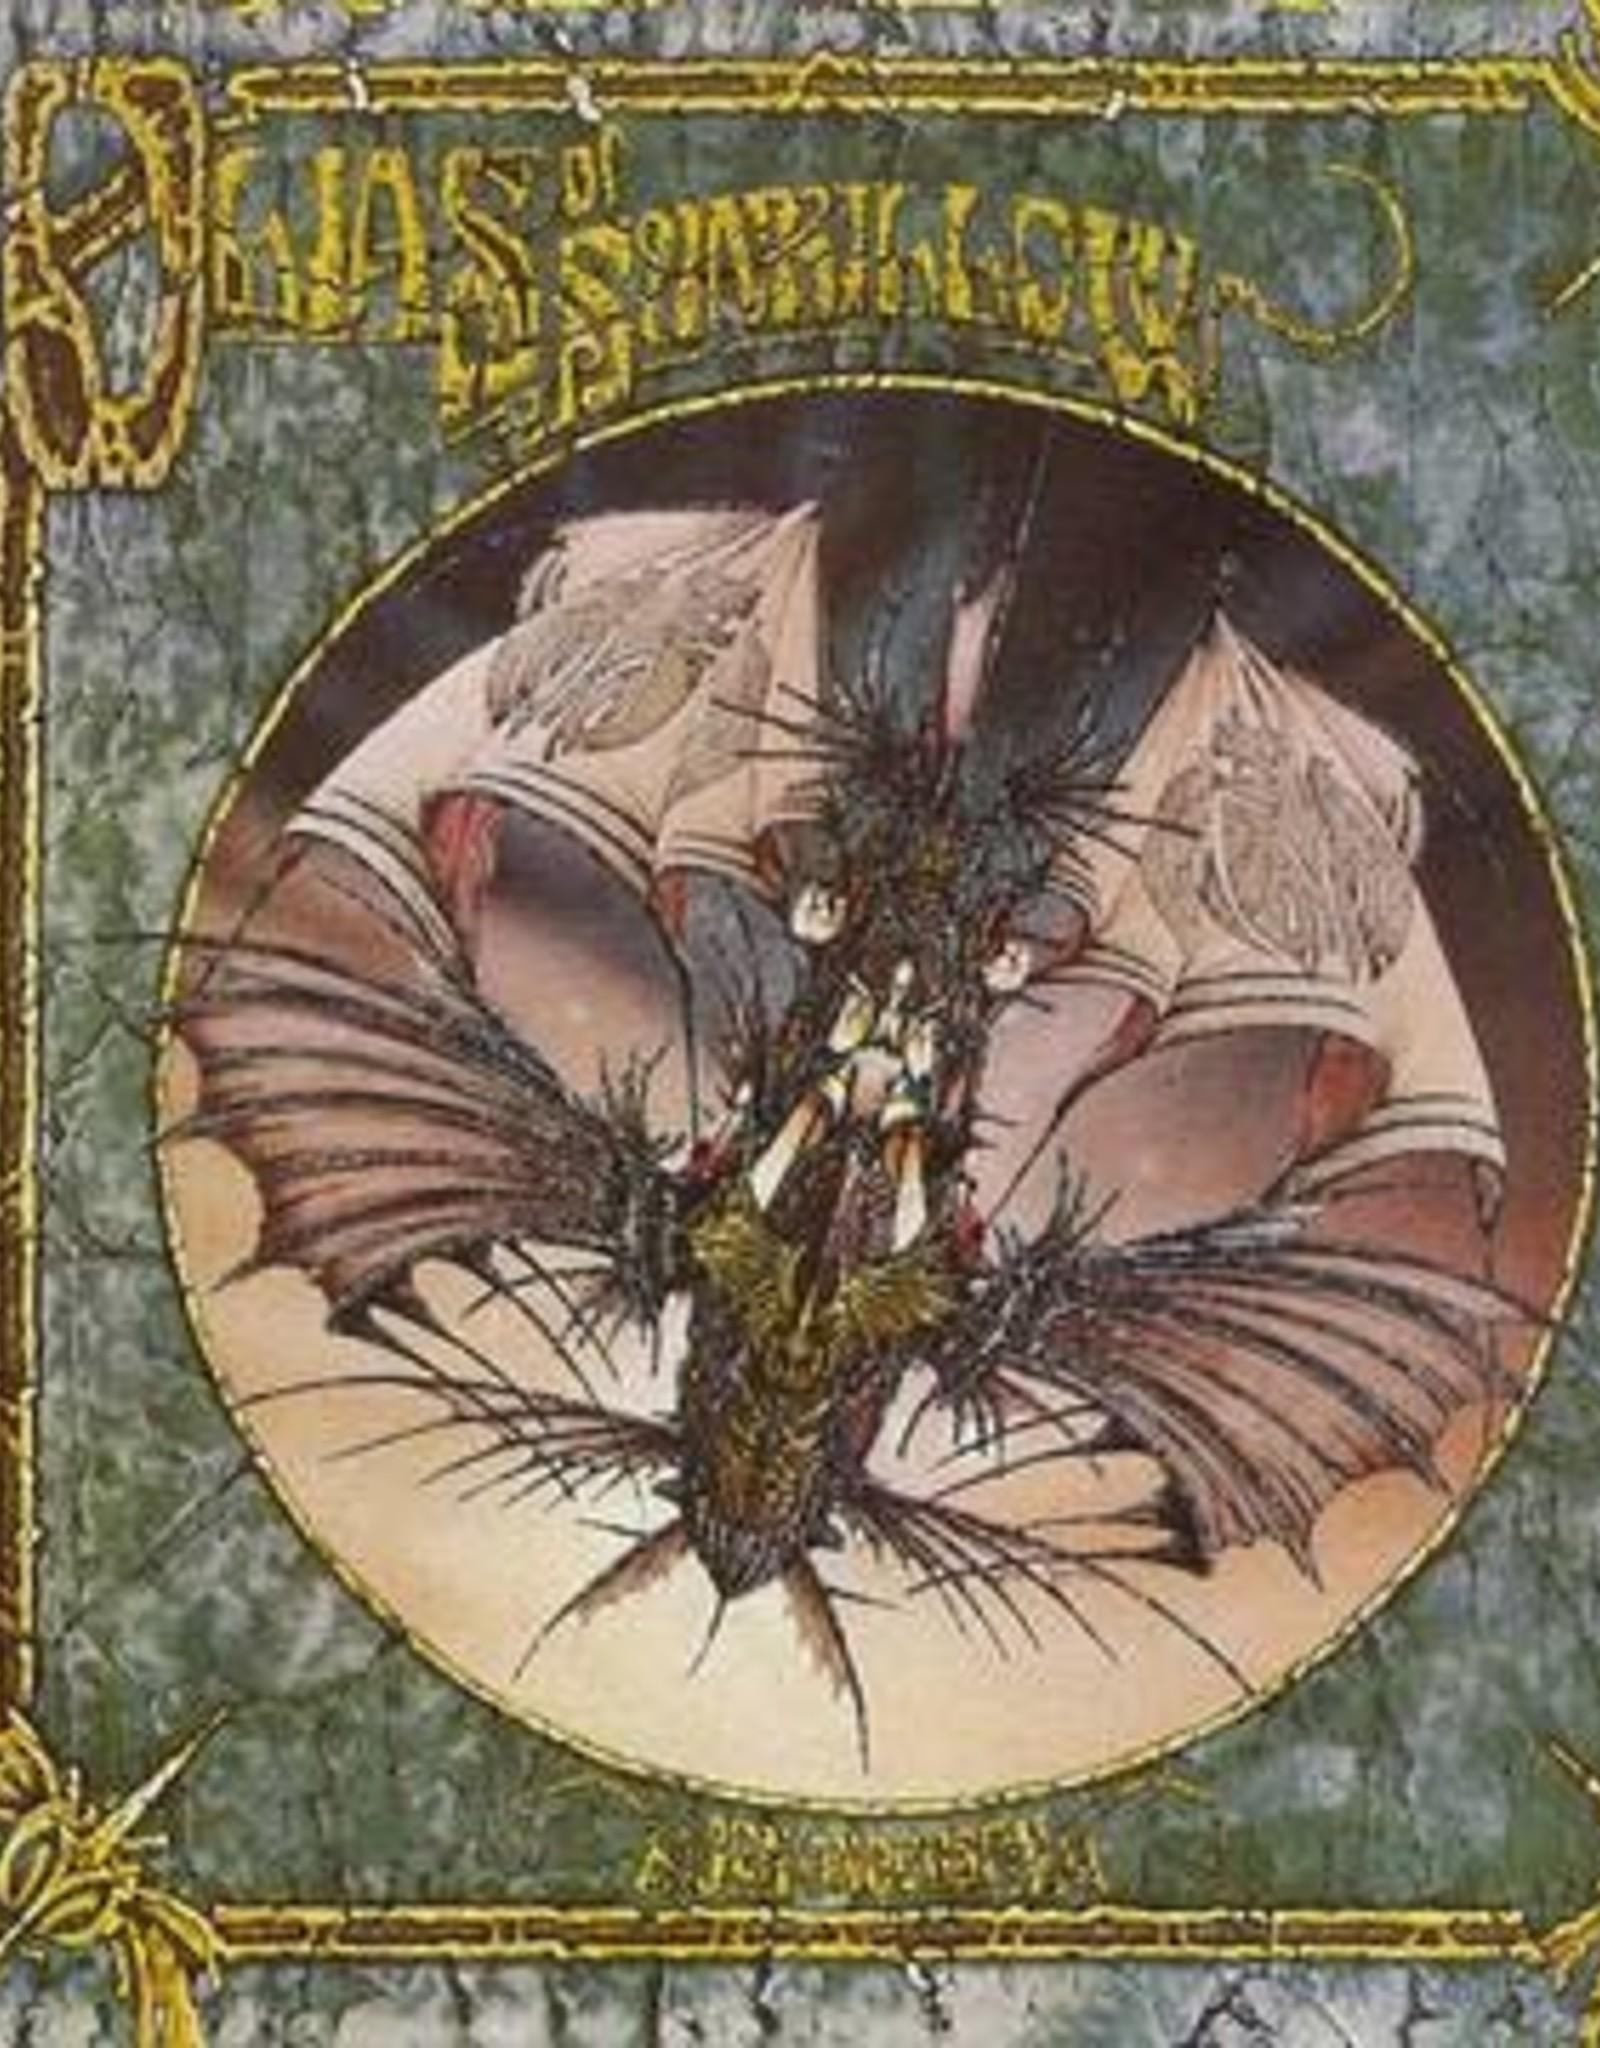 Jon Anderson - Olias Of Sunhillow: 180 Gram Re-Mastered Limited Edition Vinyl Lp (RSD 7/21)